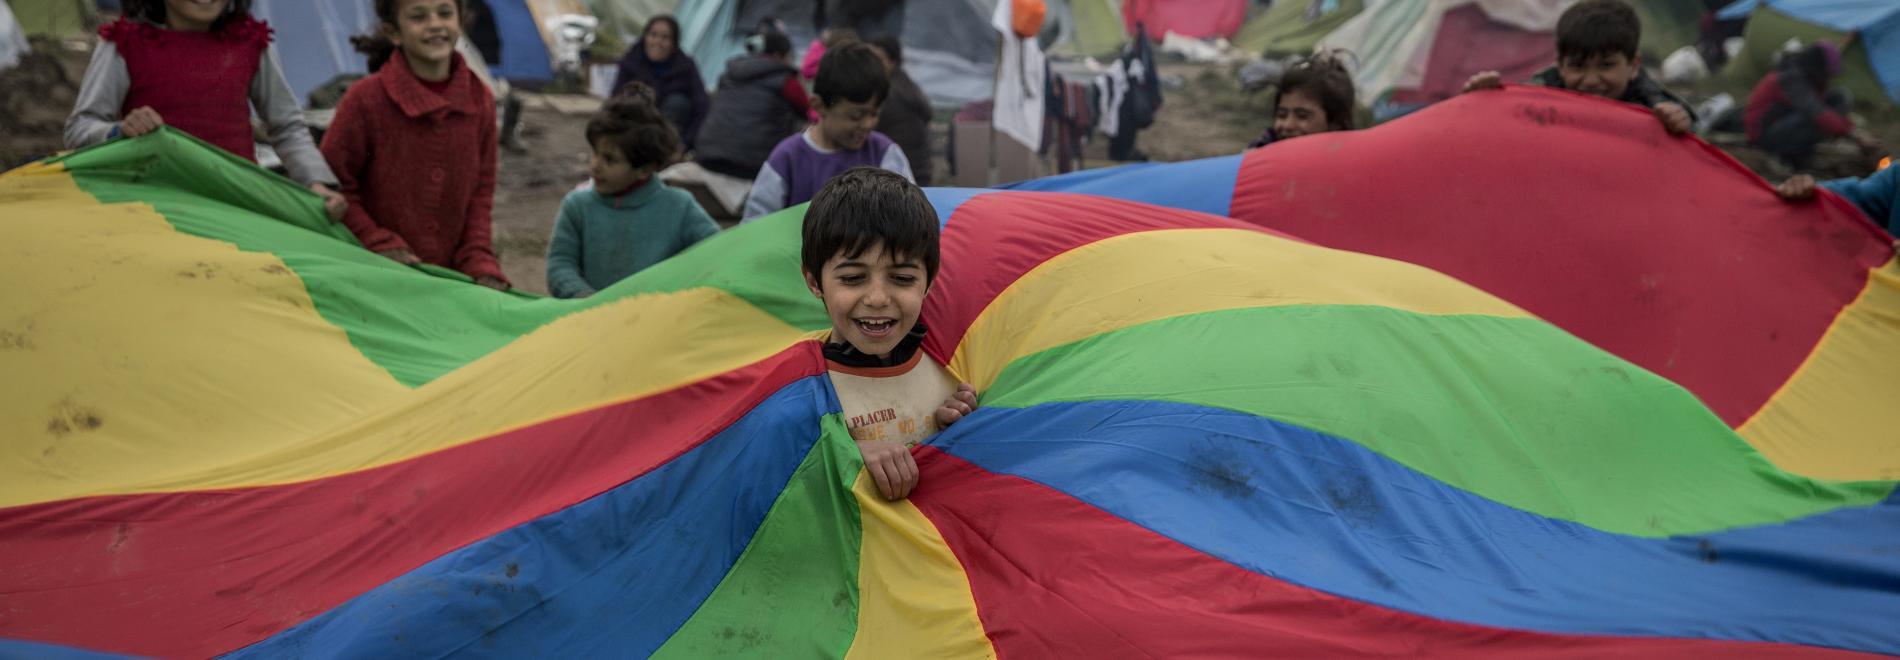 Kinder spielen in Flüchtlingscamp